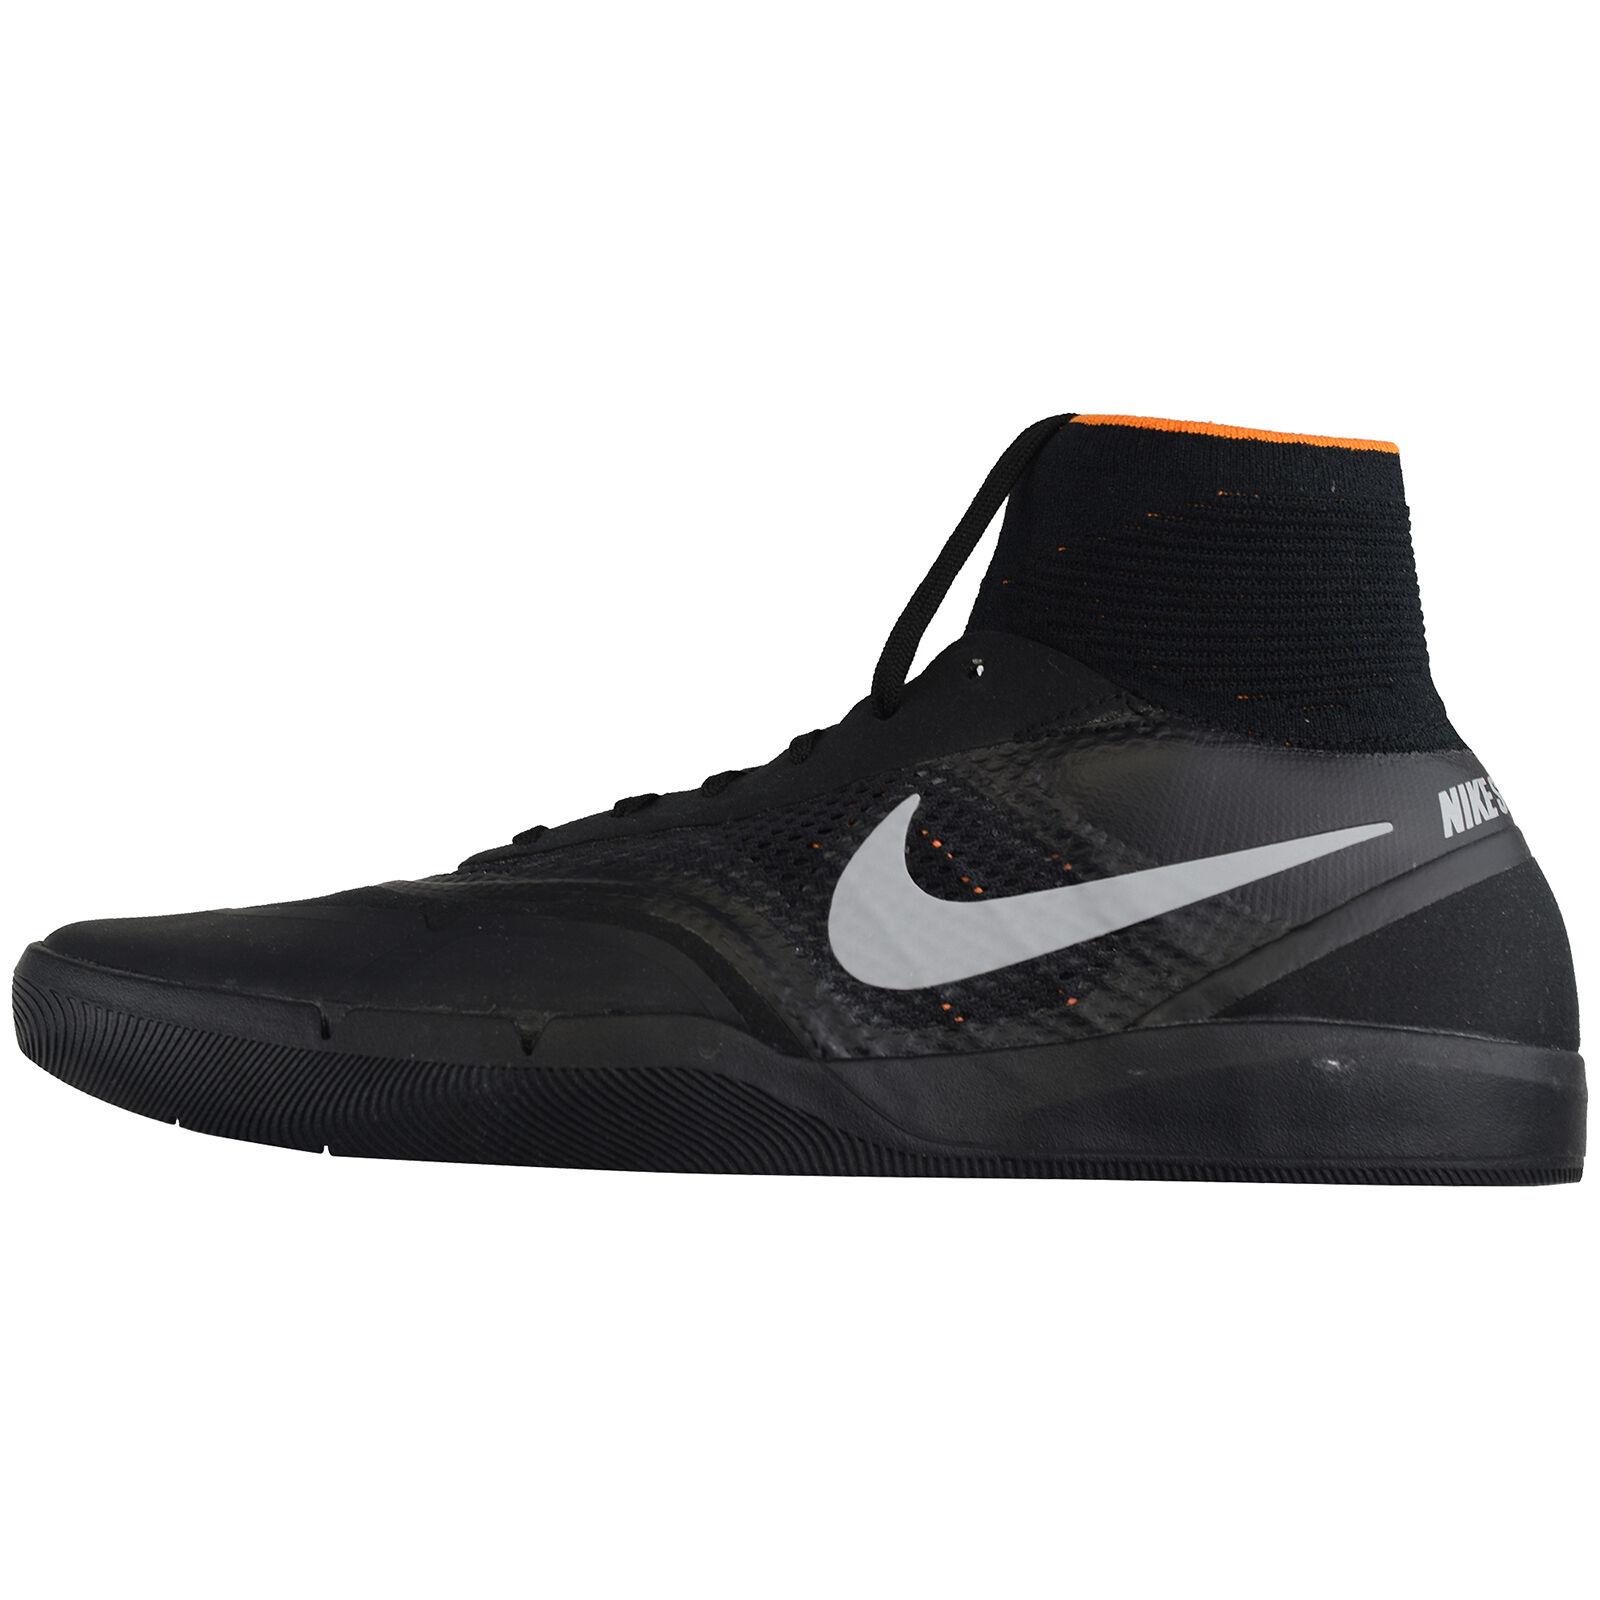 NIKE Hyperfeel Koston Koston Koston 3 XT 860627-008   Da Corsa Running  Jogging 6f6dc5